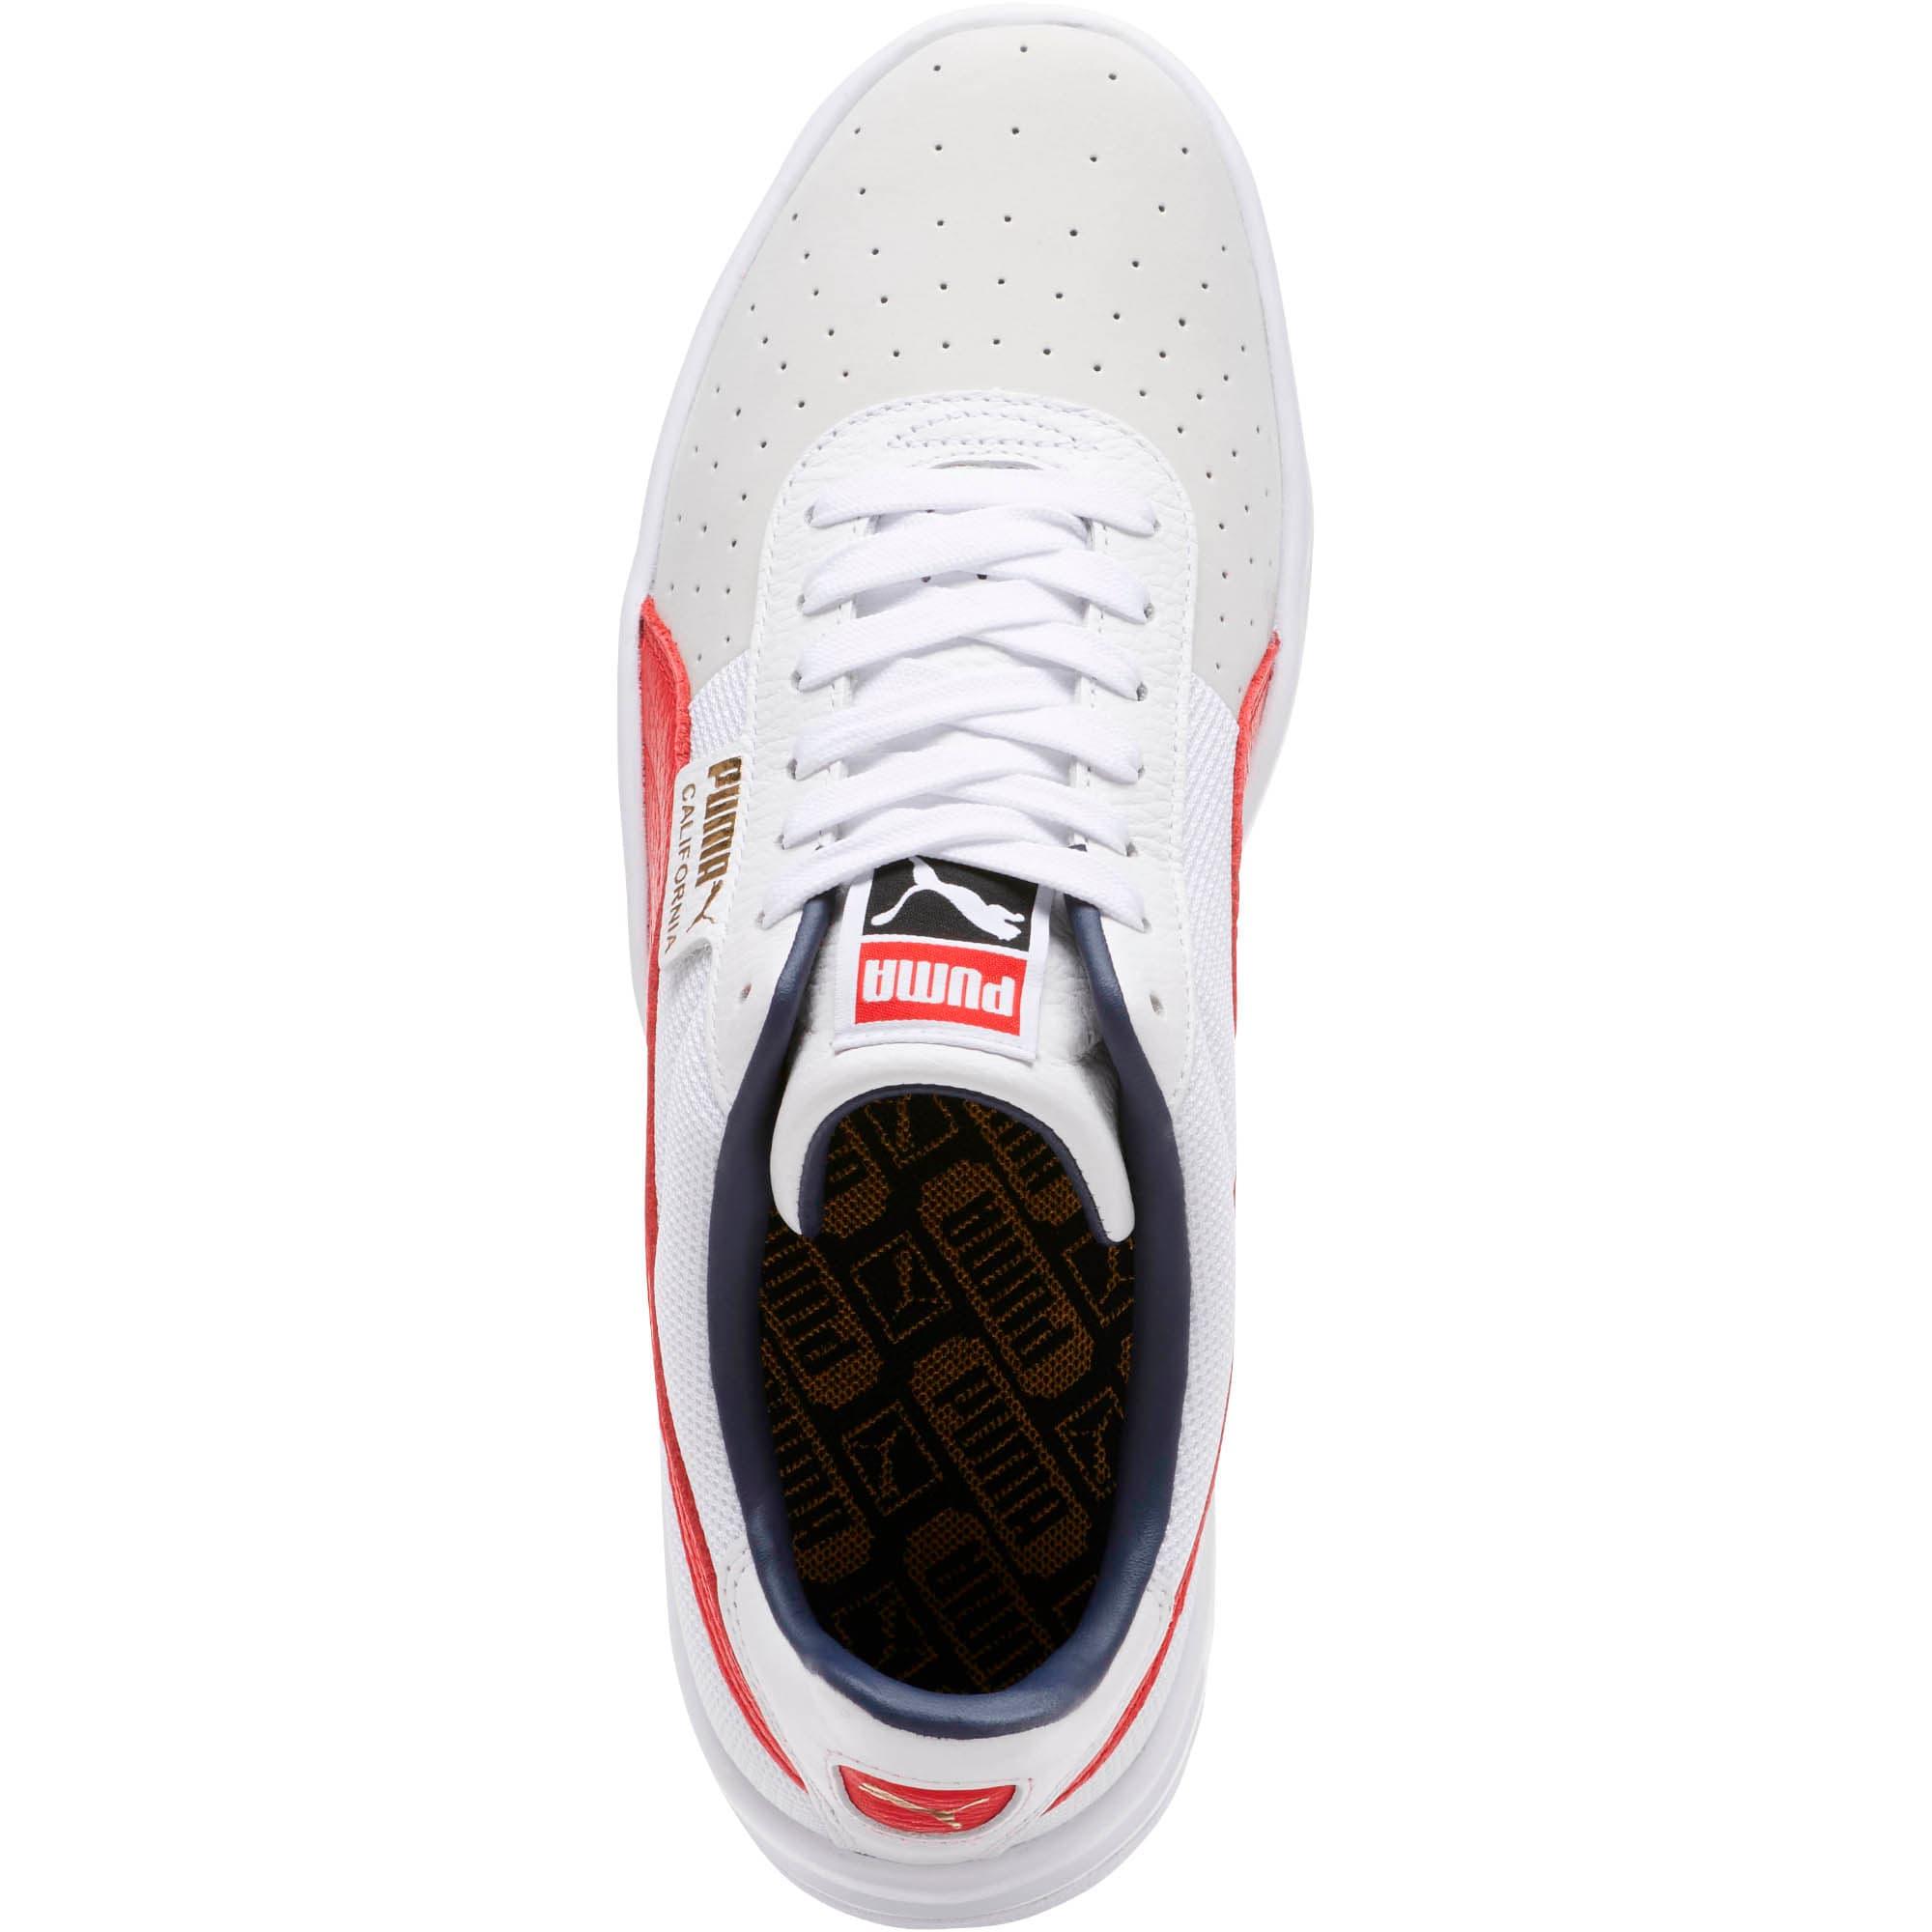 Thumbnail 5 of California Casual Sneakers, P White-RibbonRed-P White, medium